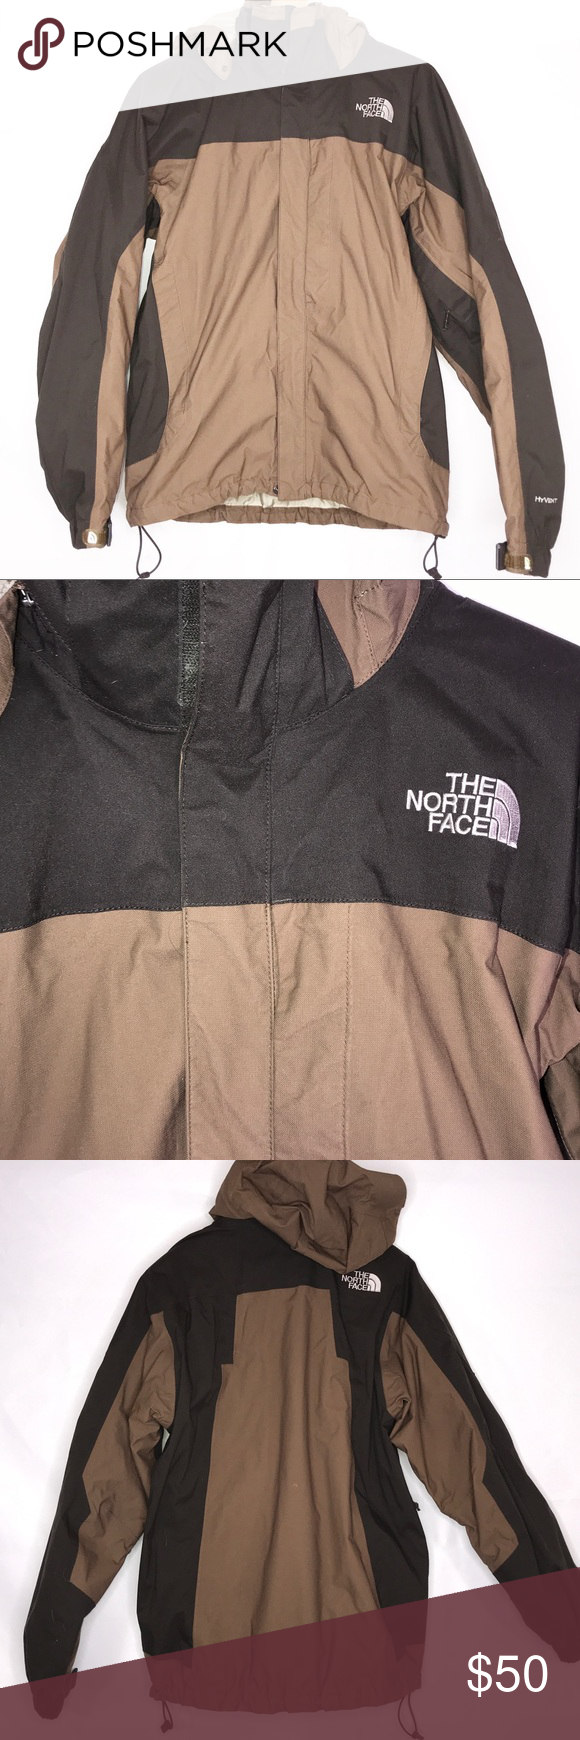 The North Face Men S Medium Brown Jacket Hyvent Brown Jacket North Face Mens Jackets [ 1740 x 580 Pixel ]